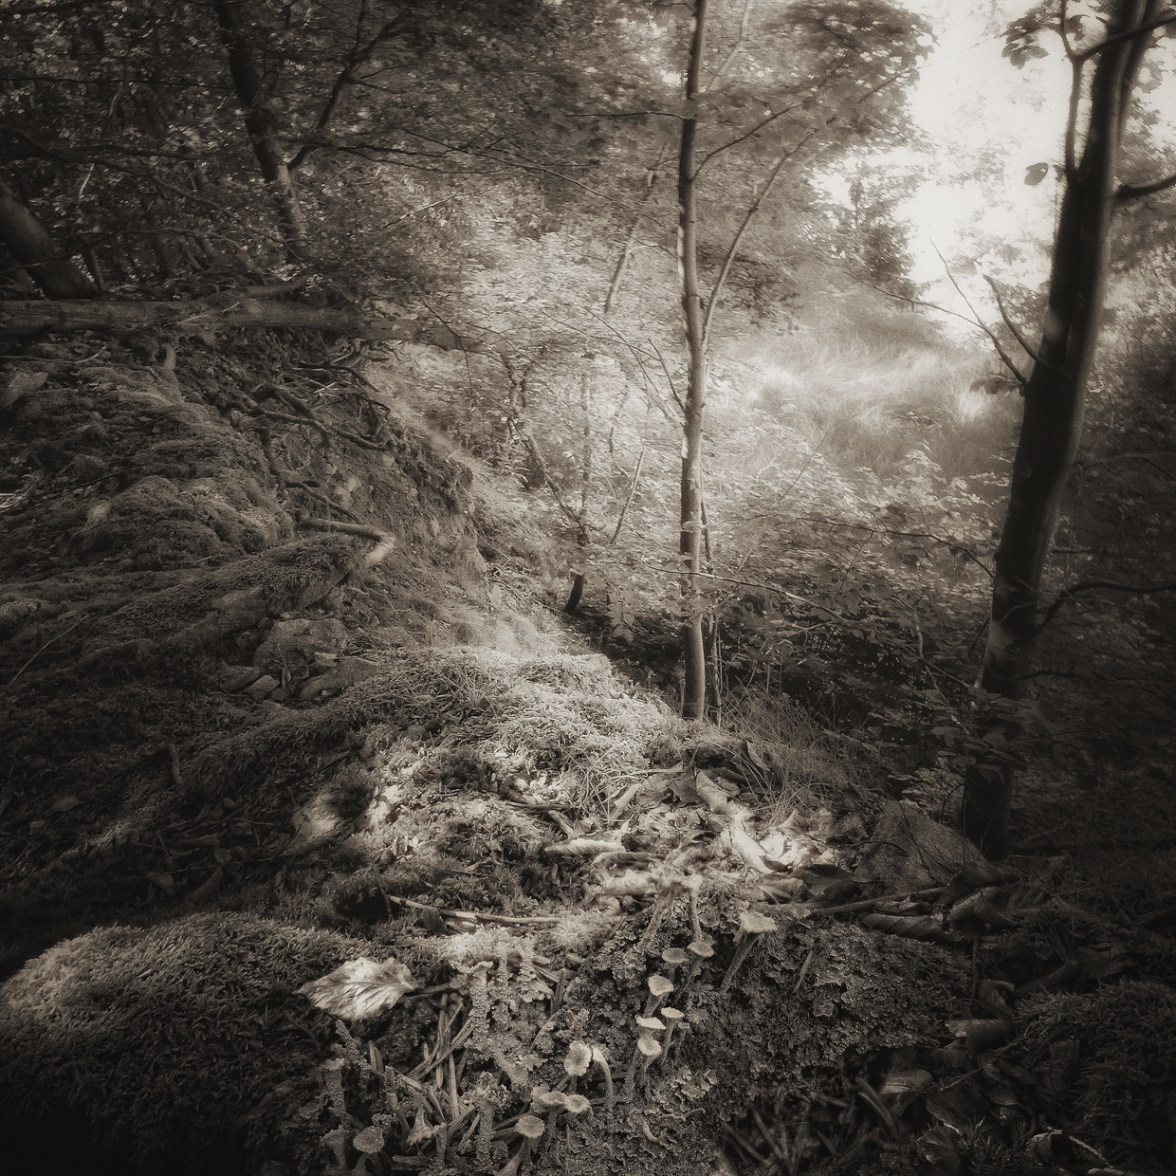 Monochrome 280 © Bernd Webler